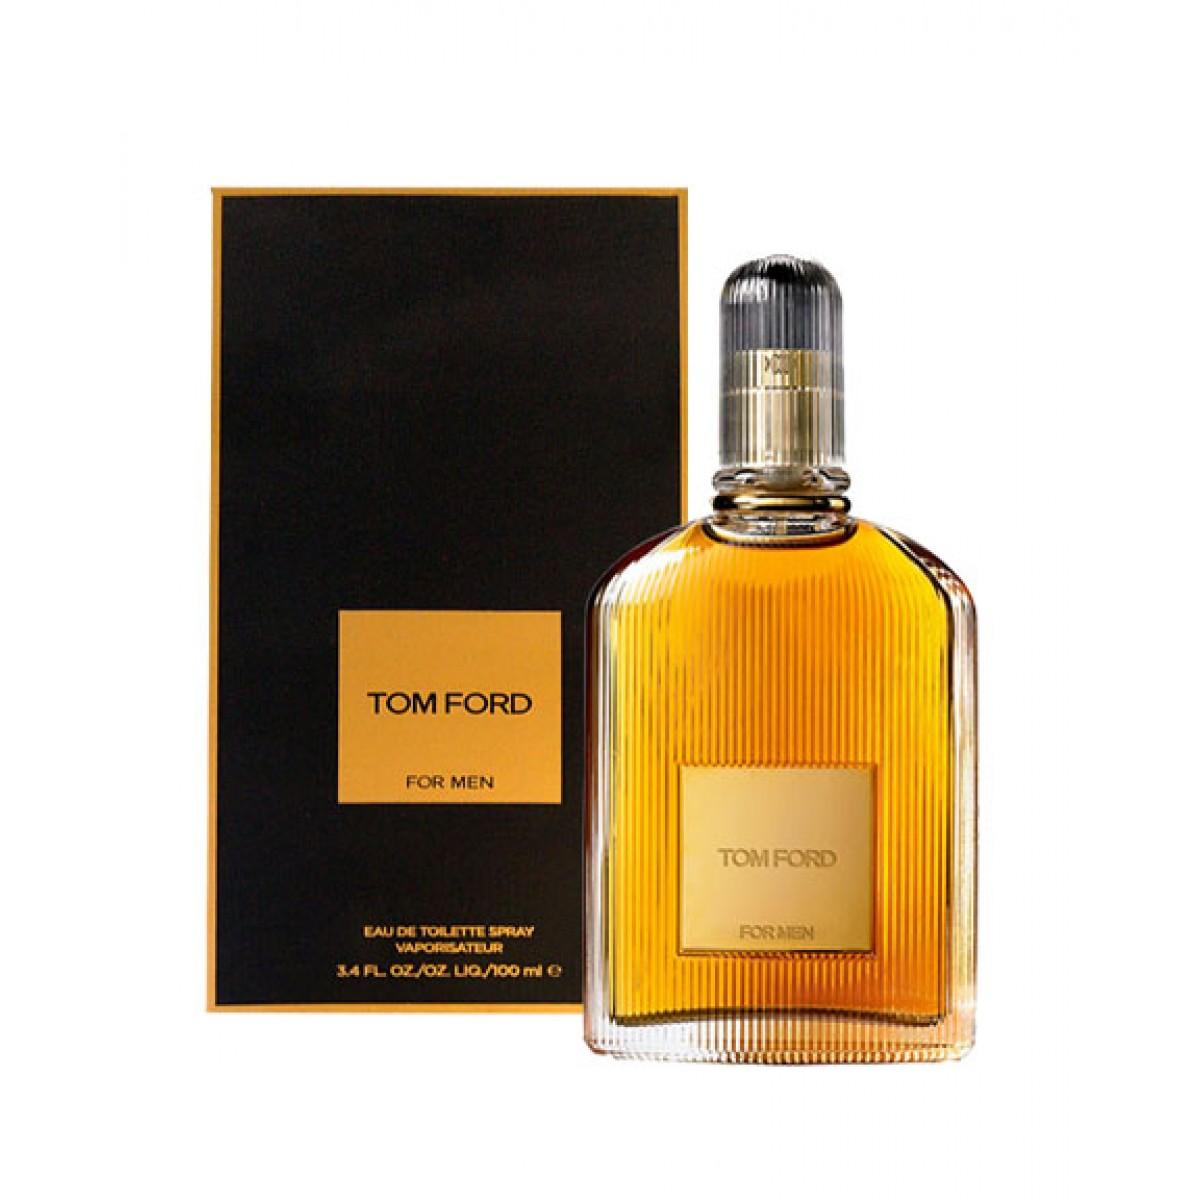 7bd9418b814c Tom Ford EDT Perfume Price in Pakistan